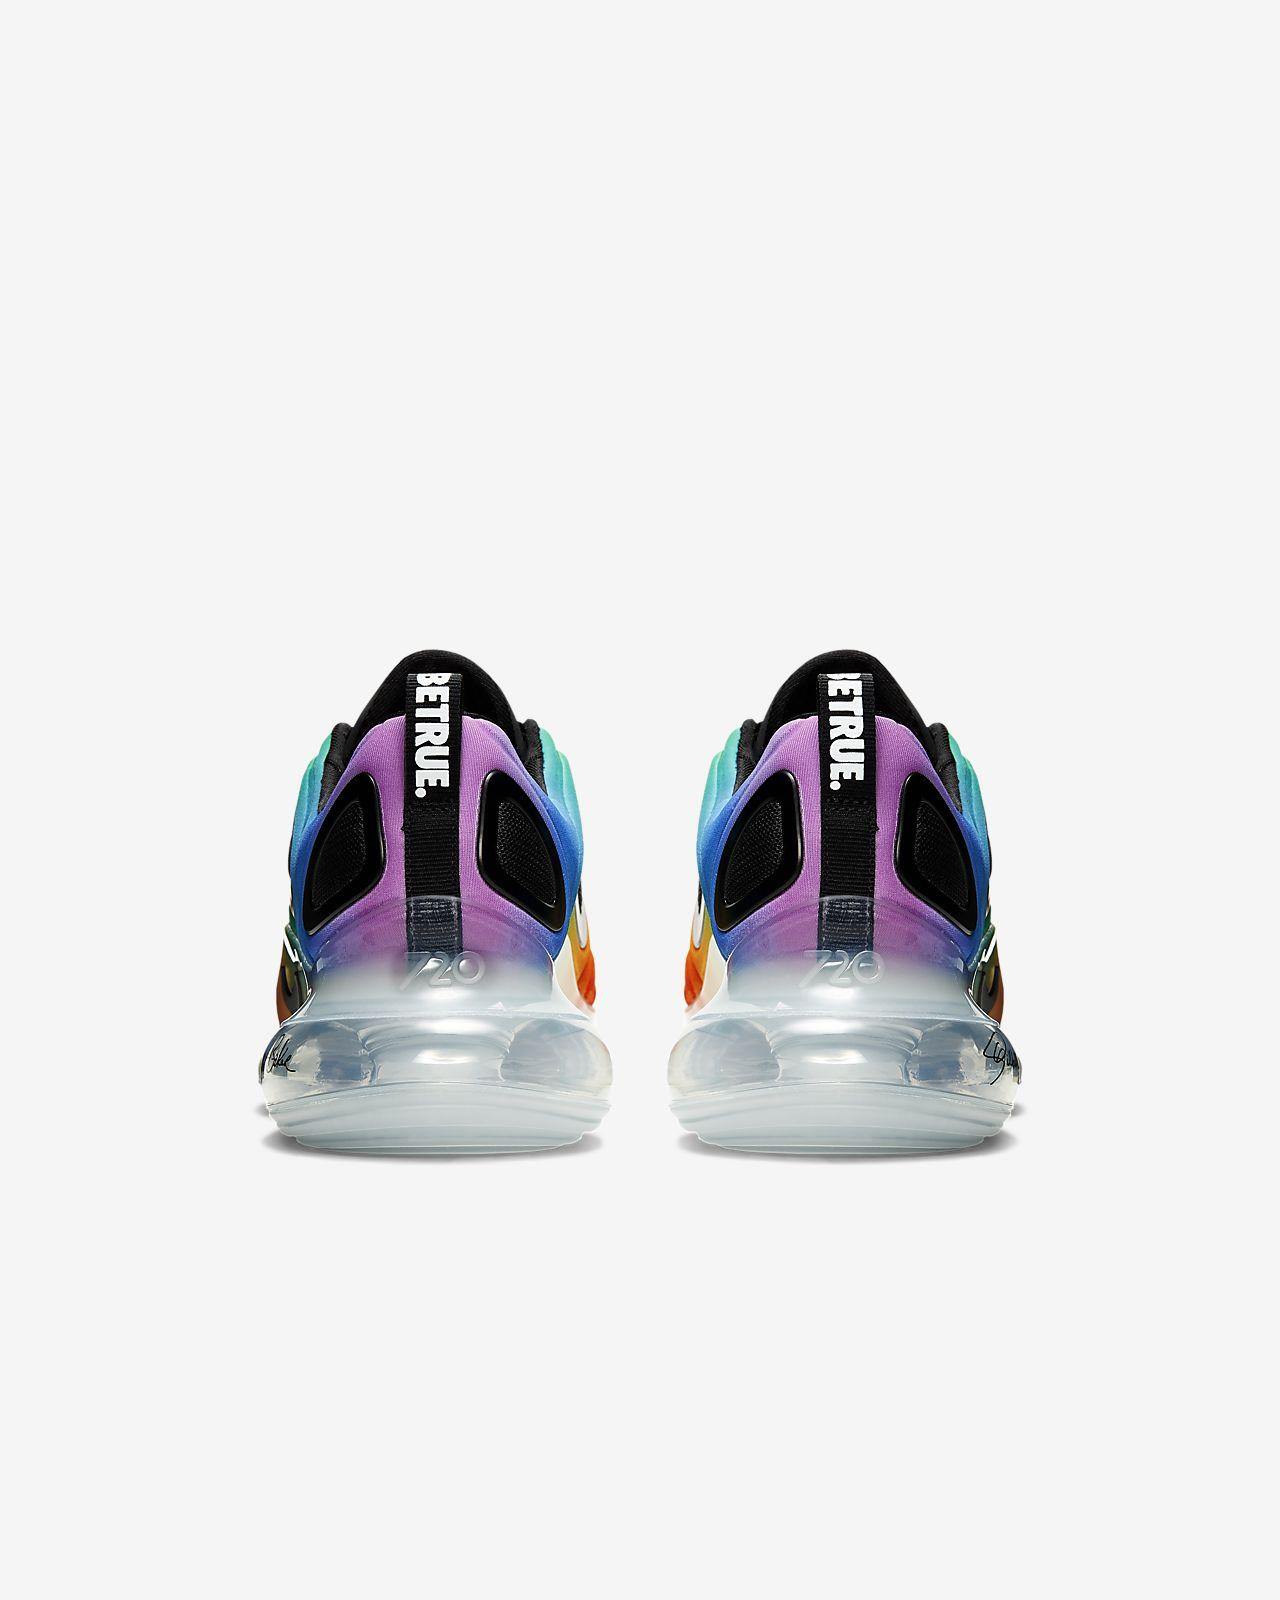 Calzado Nike Air Max 720 BETRUE